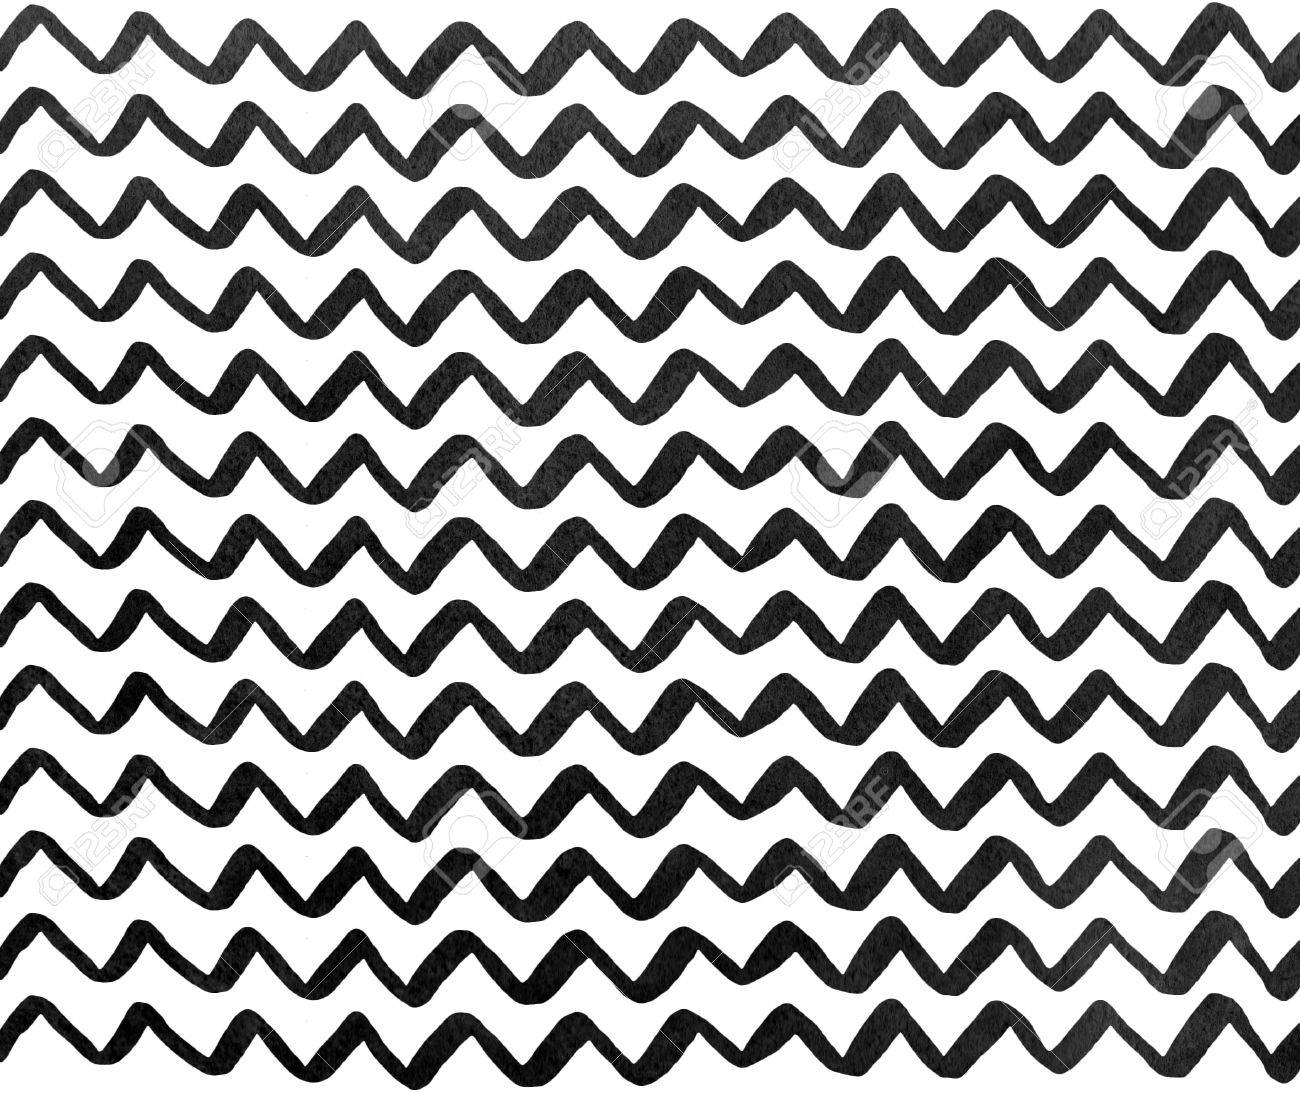 watercolor black hand painted stripes pattern chevron stock photo Cool Blue Chevron Background stock photo watercolor black hand painted stripes pattern chevron